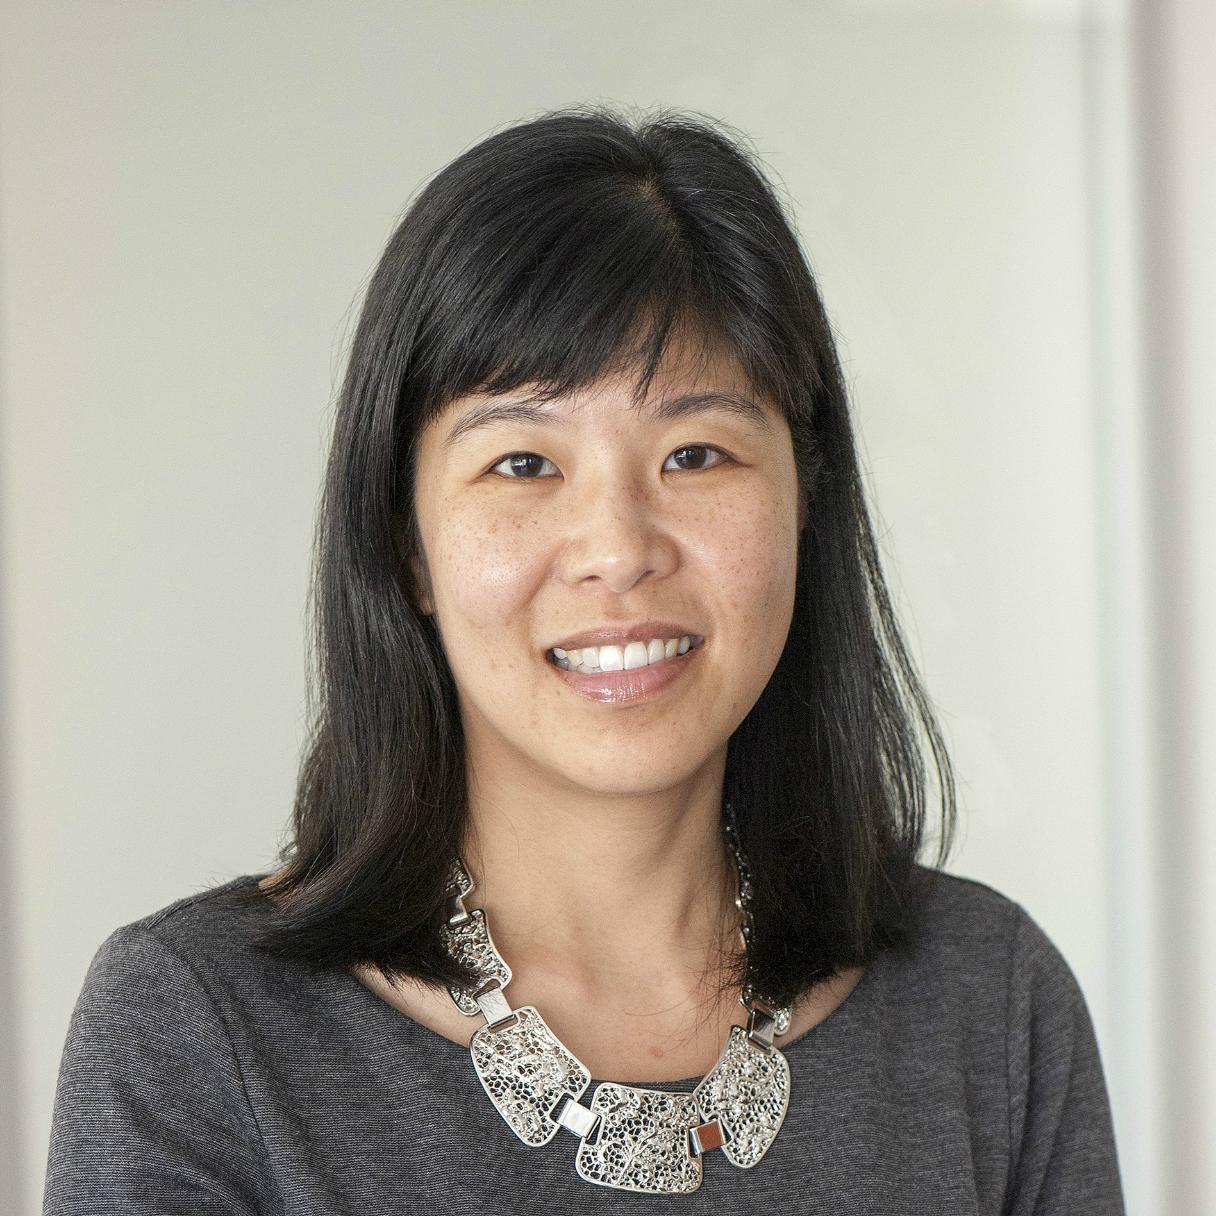 Kimberly Ellen Liu | Department of Obstetrics and Gynaecology